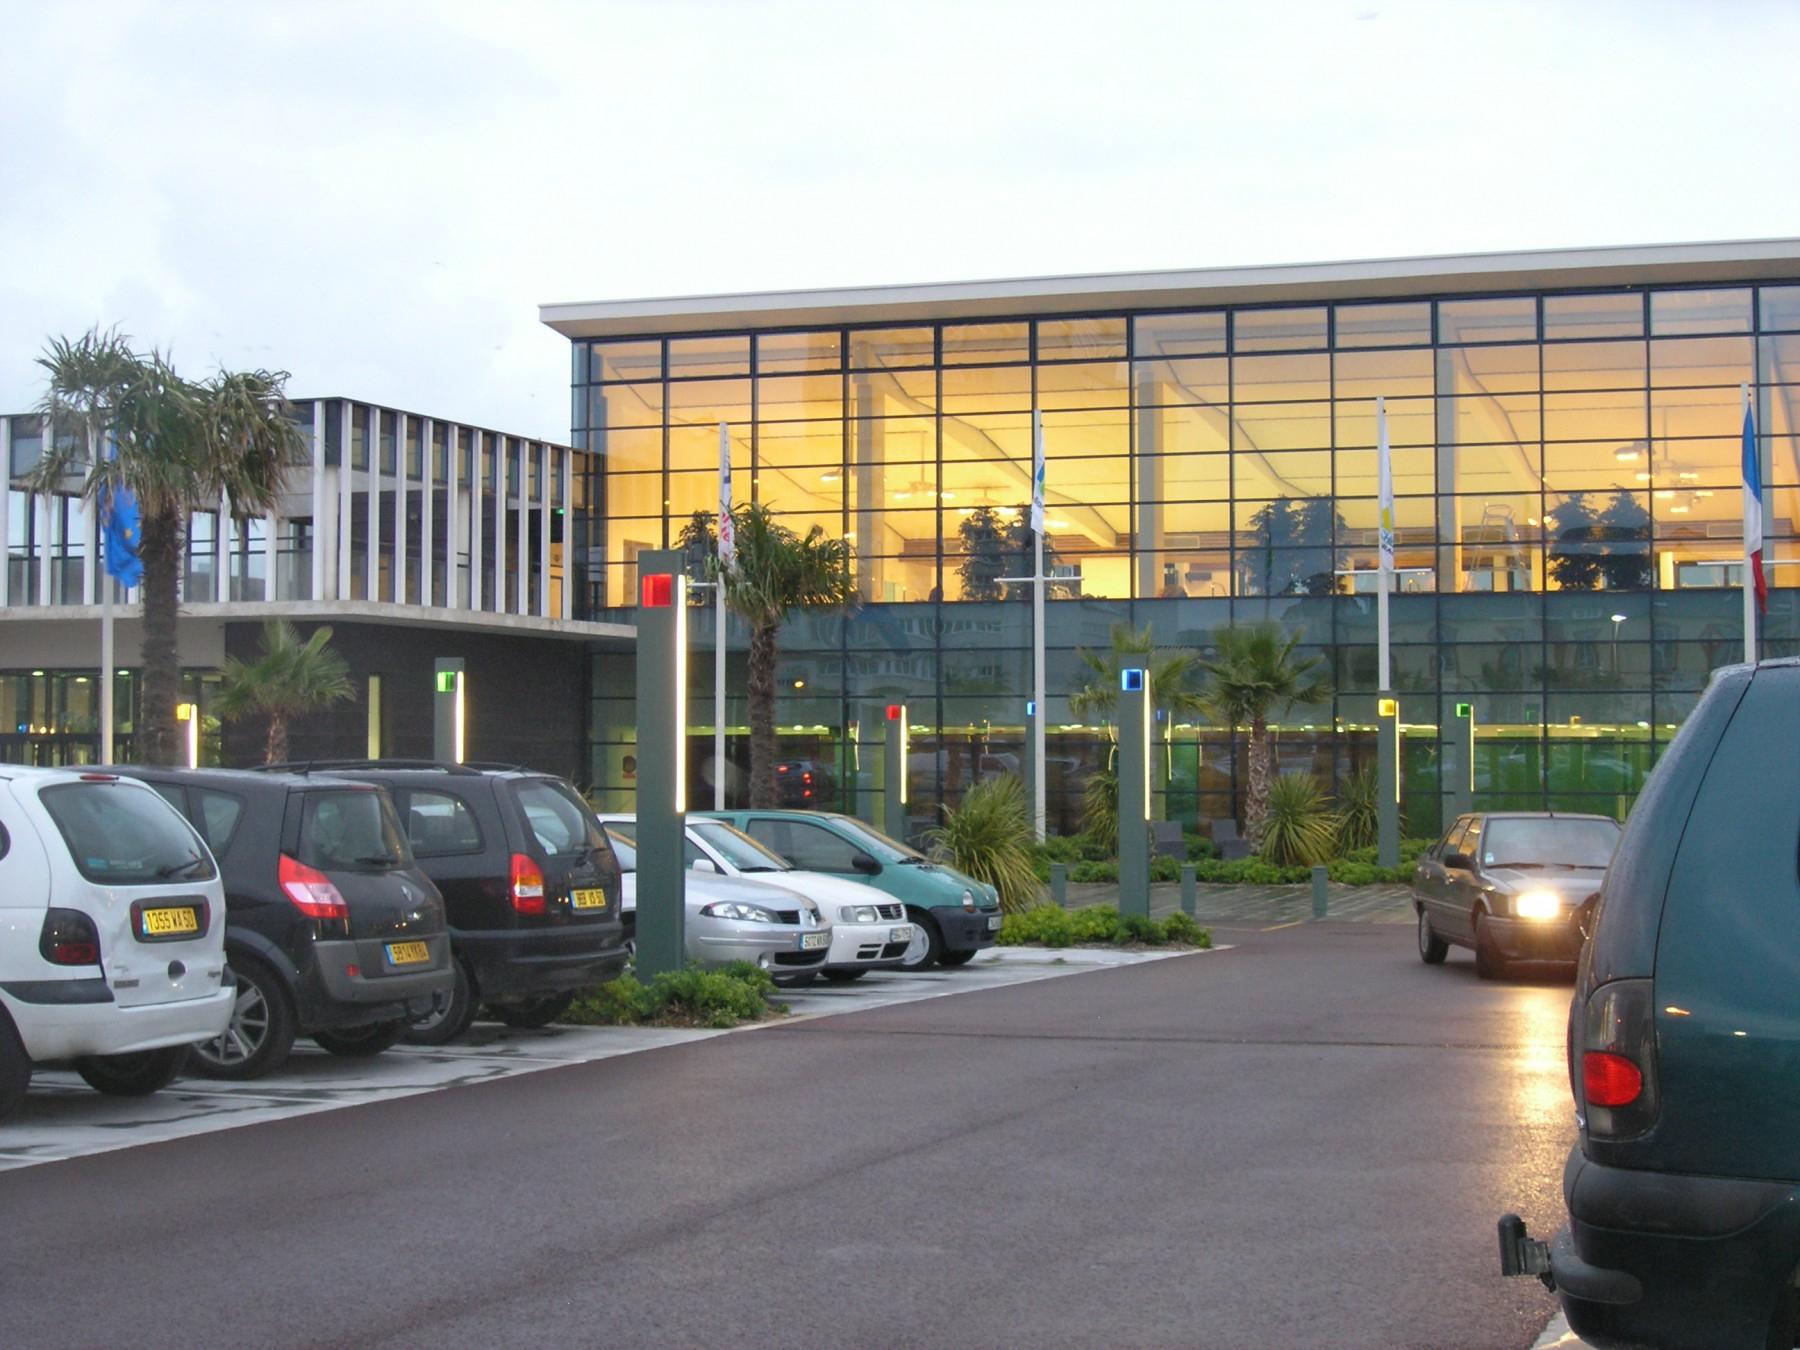 Studio Nemo - Architecture, Urbanisme, Paysage pour Piscine Cherbourg